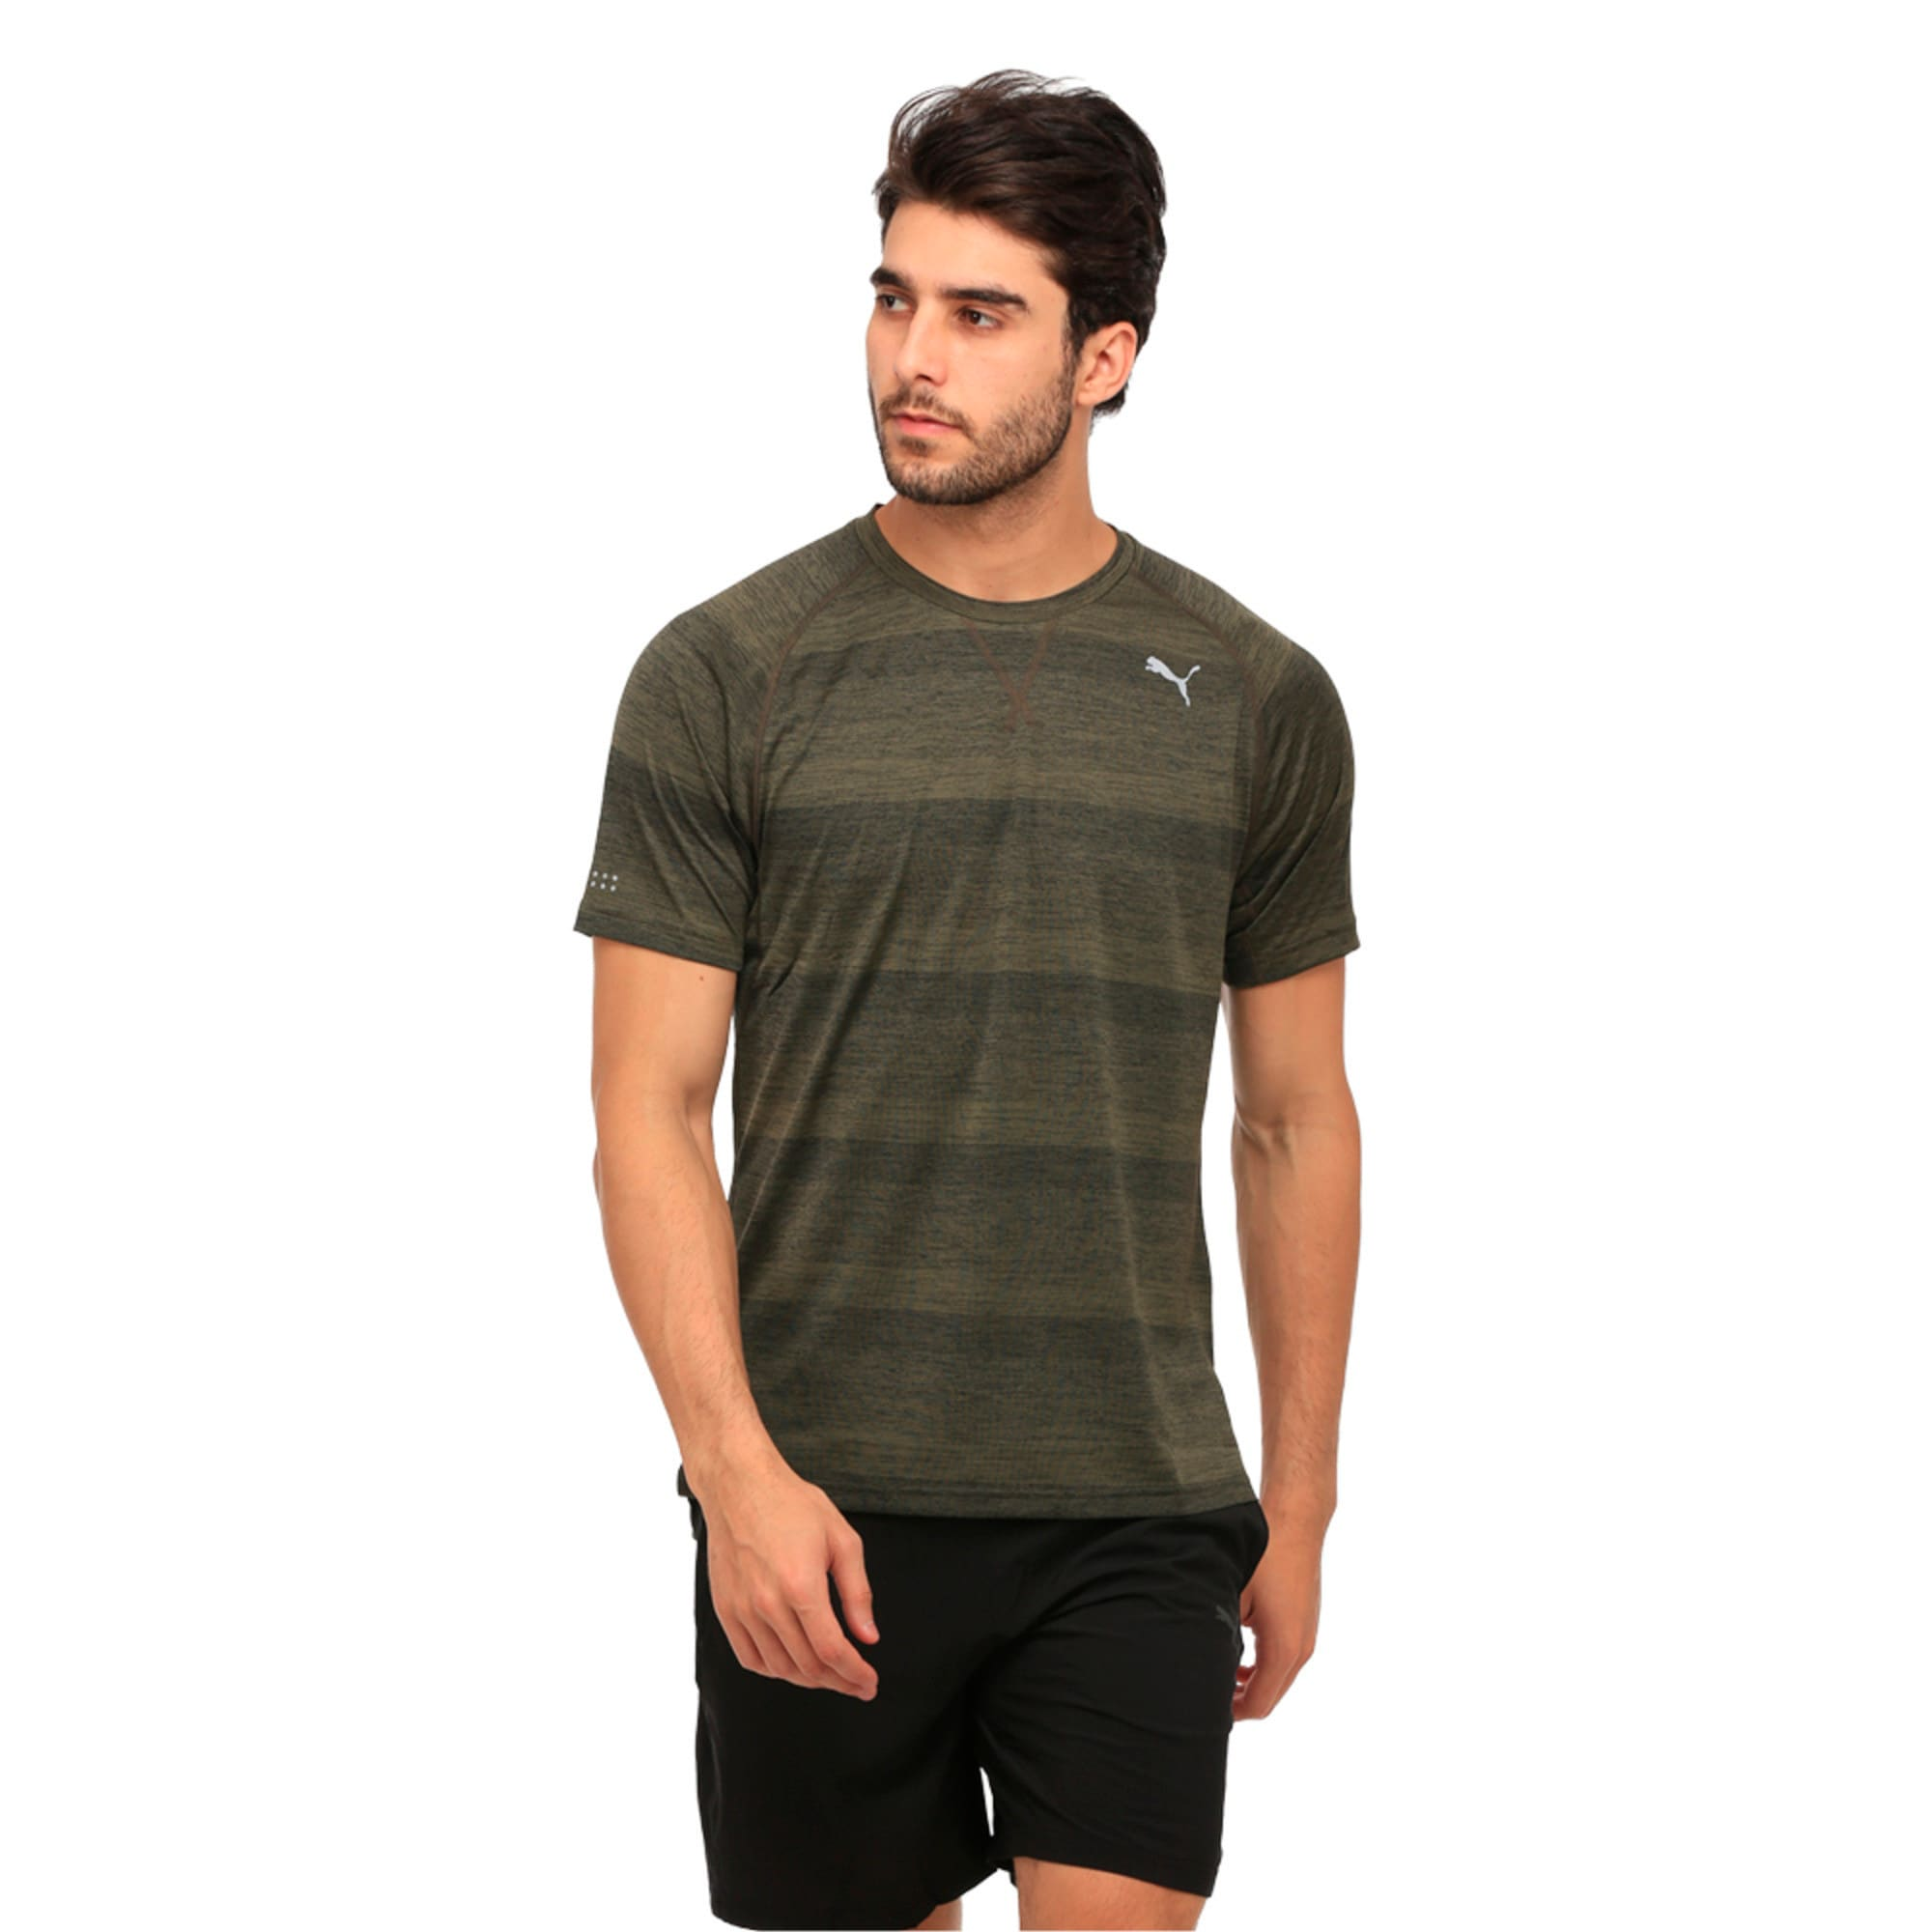 Thumbnail 3 of Running Men's Energy T-Shirt, Olive Night Heather, medium-IND